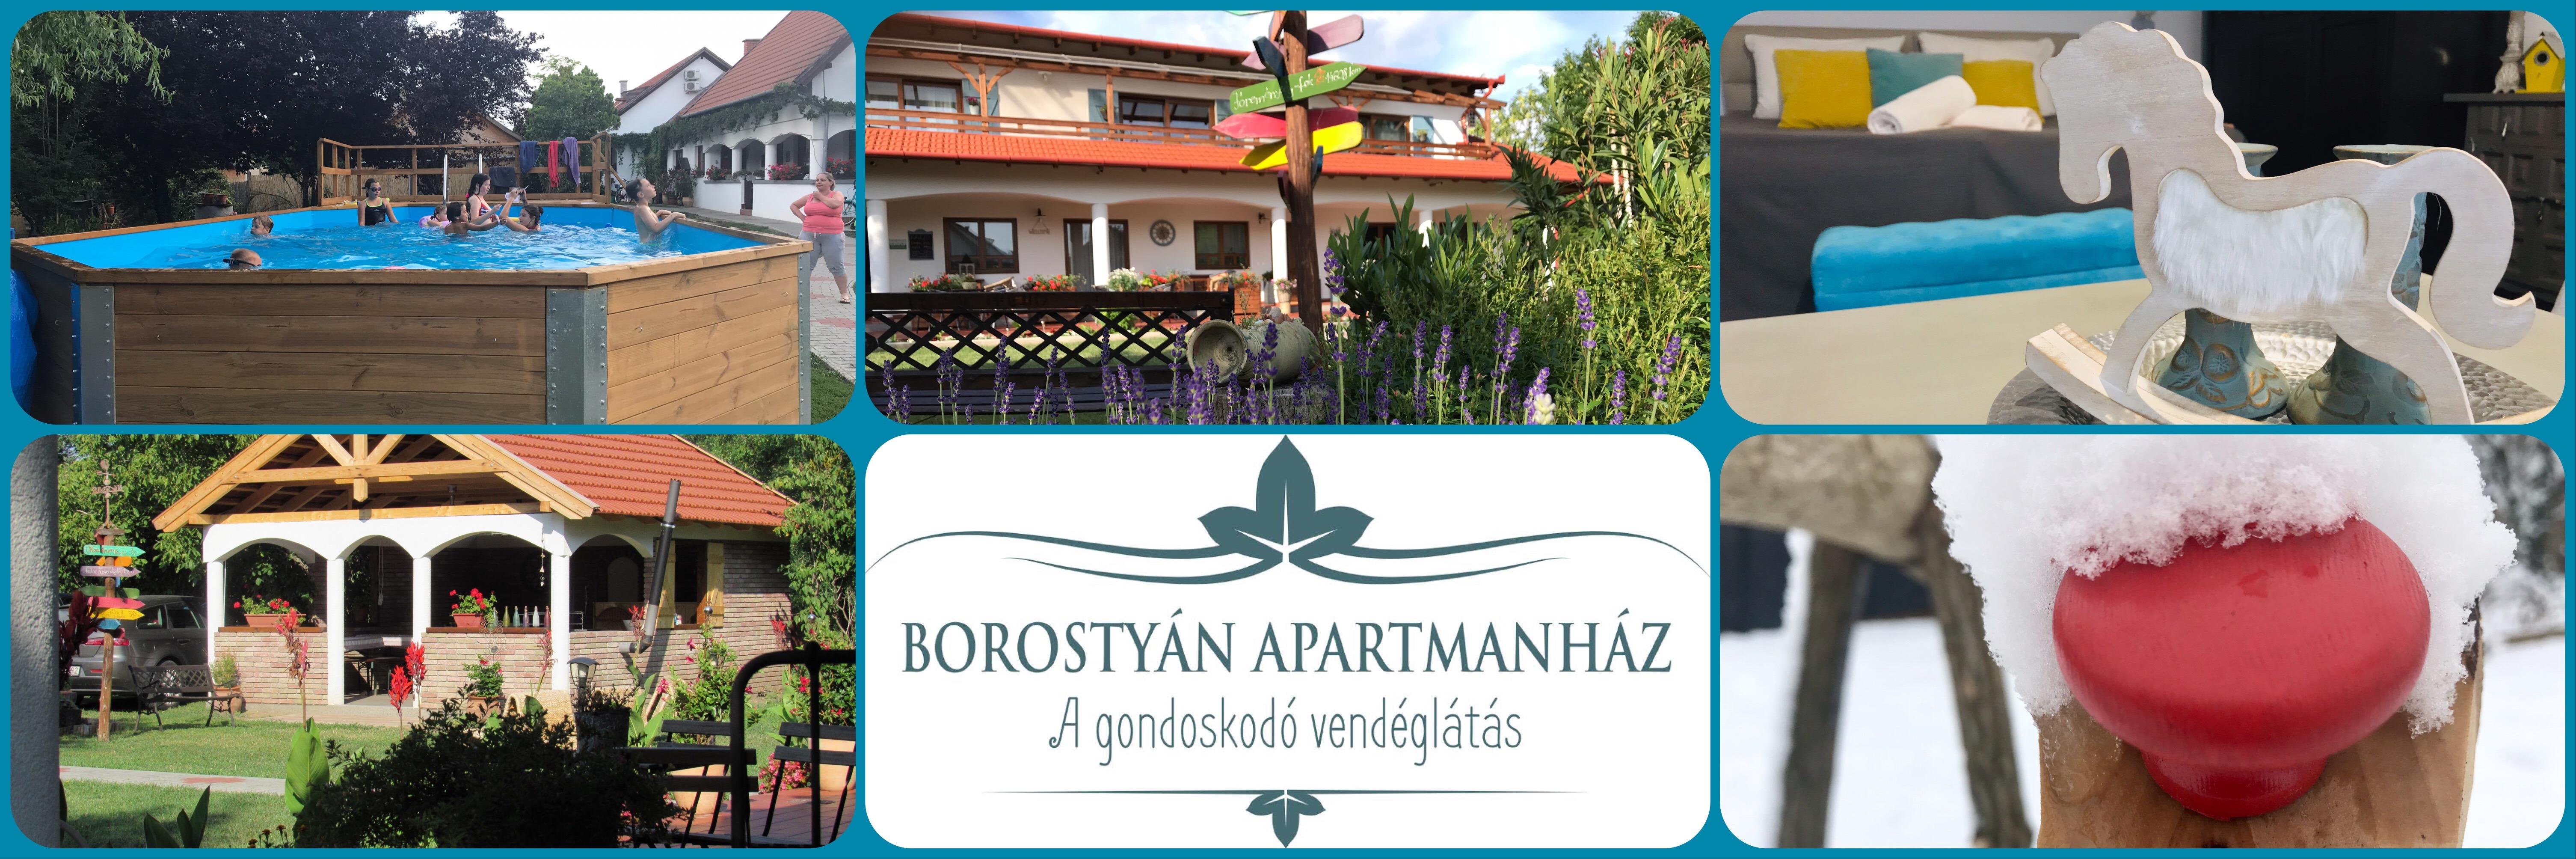 borostyan_blogos.jpg